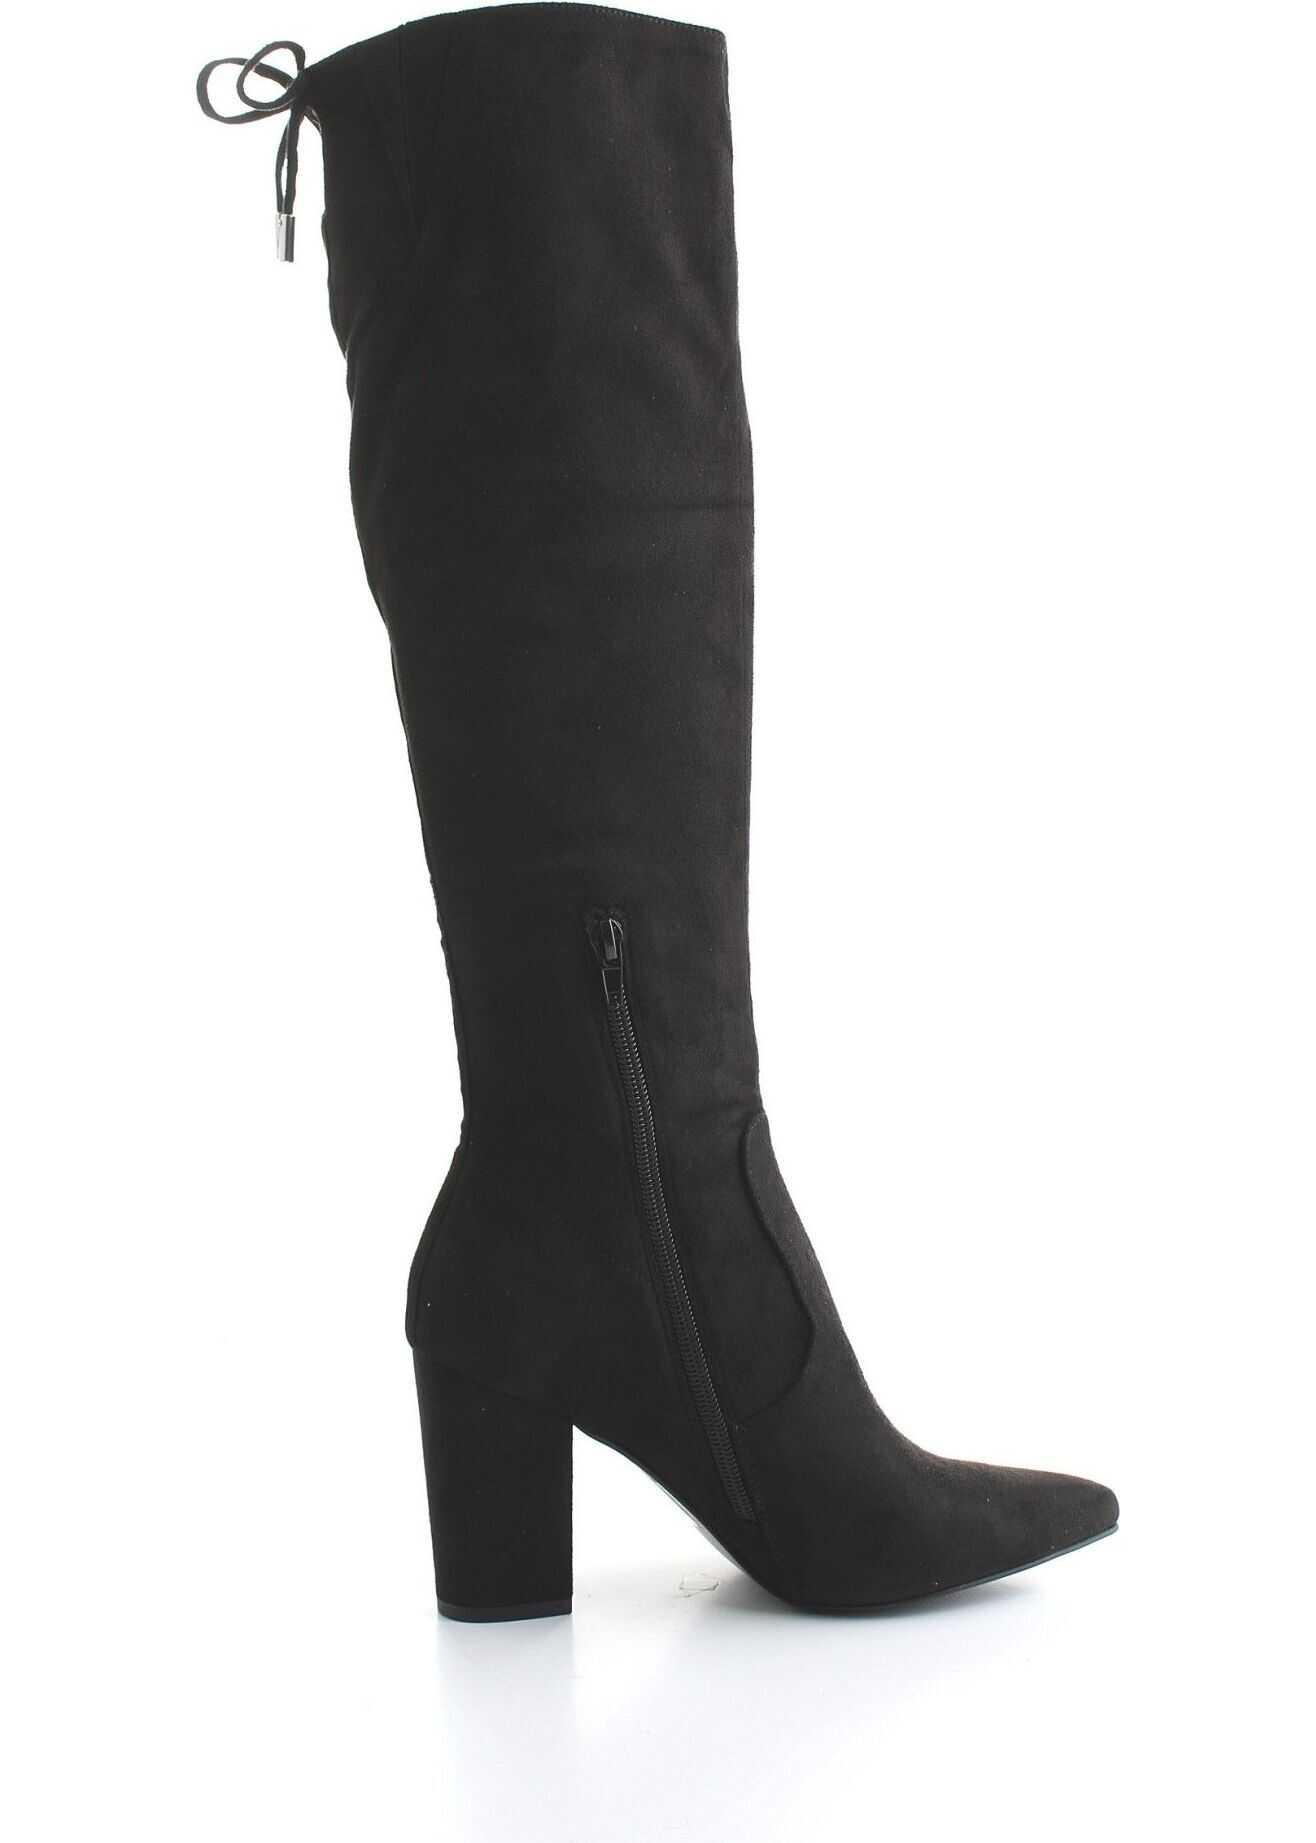 Steve Madden Leather Boots BLACK